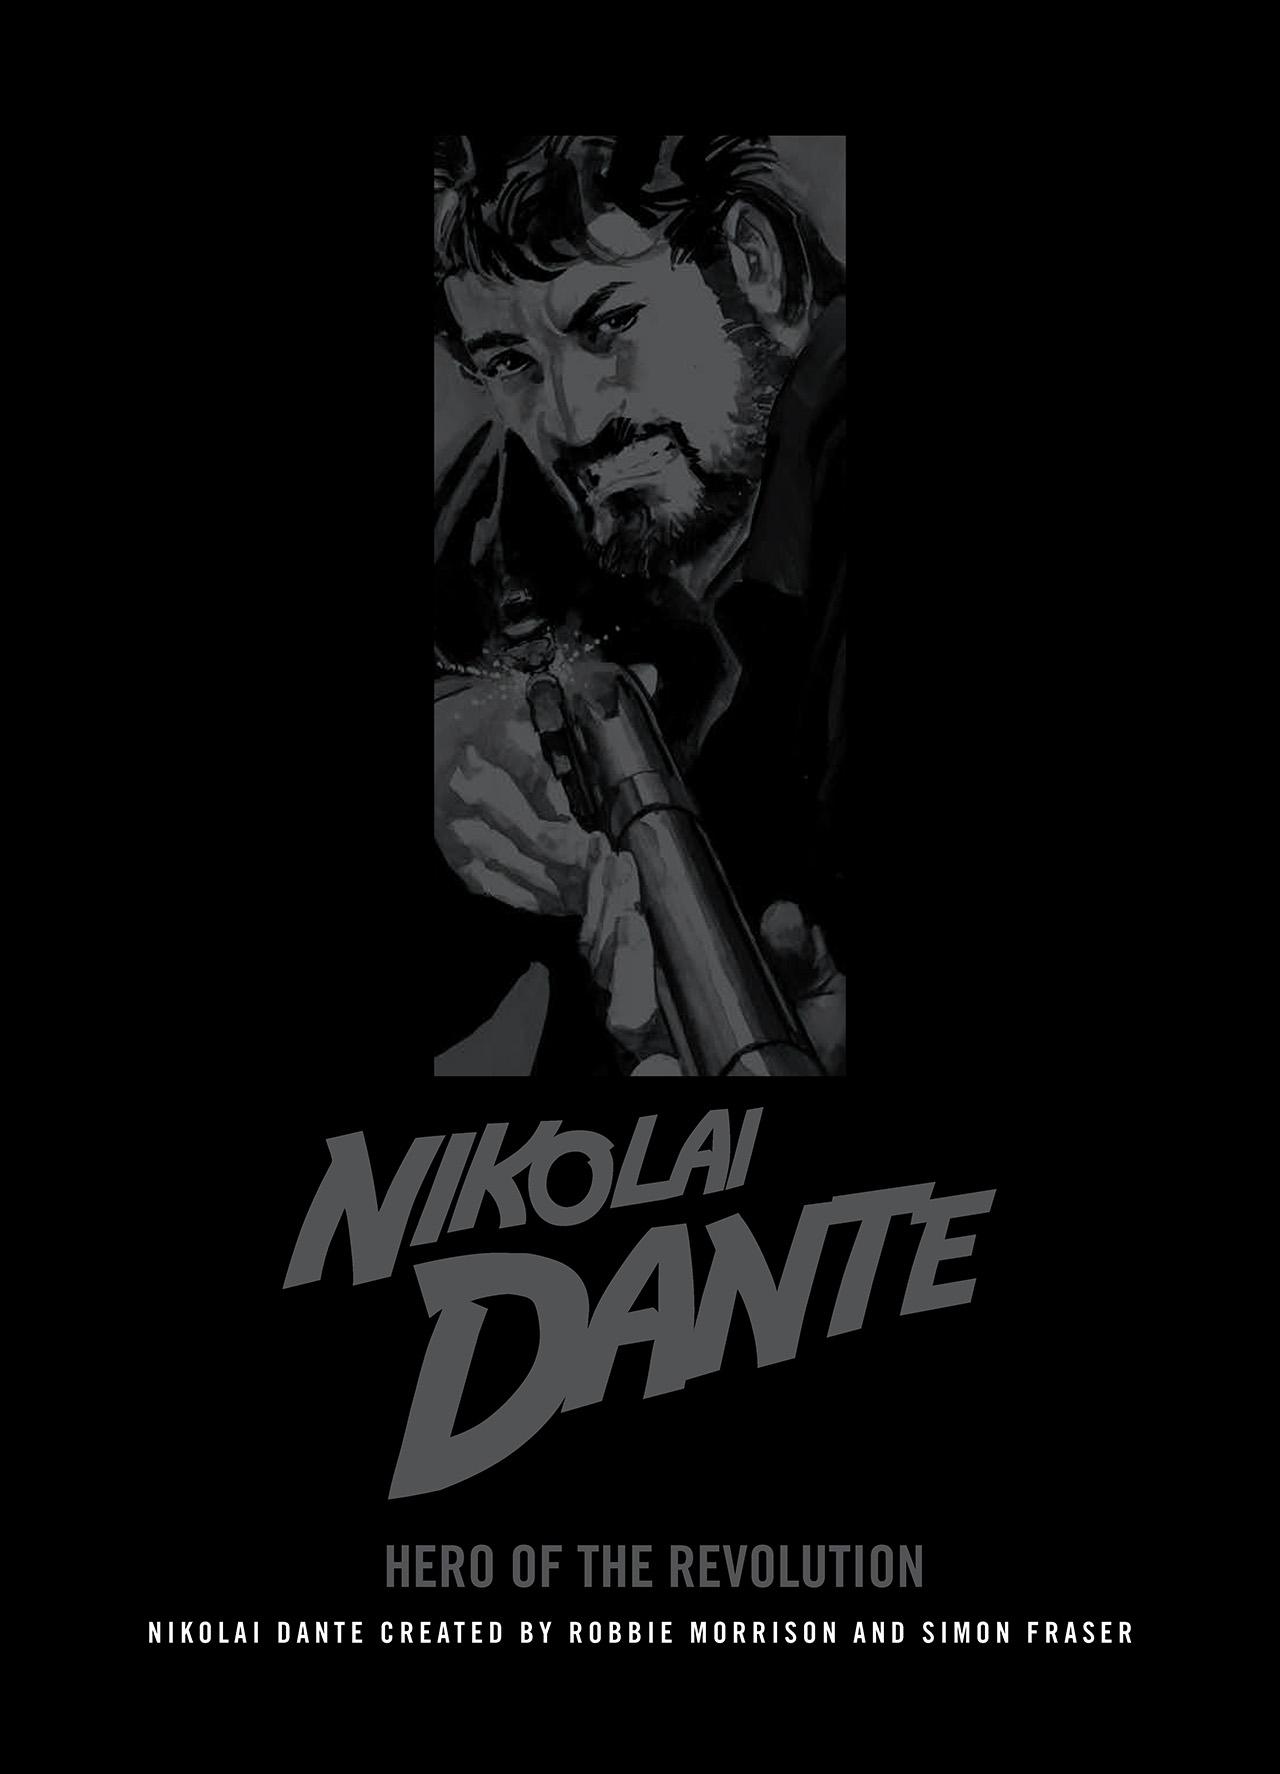 Read online Nikolai Dante comic -  Issue # TPB 10 - 3